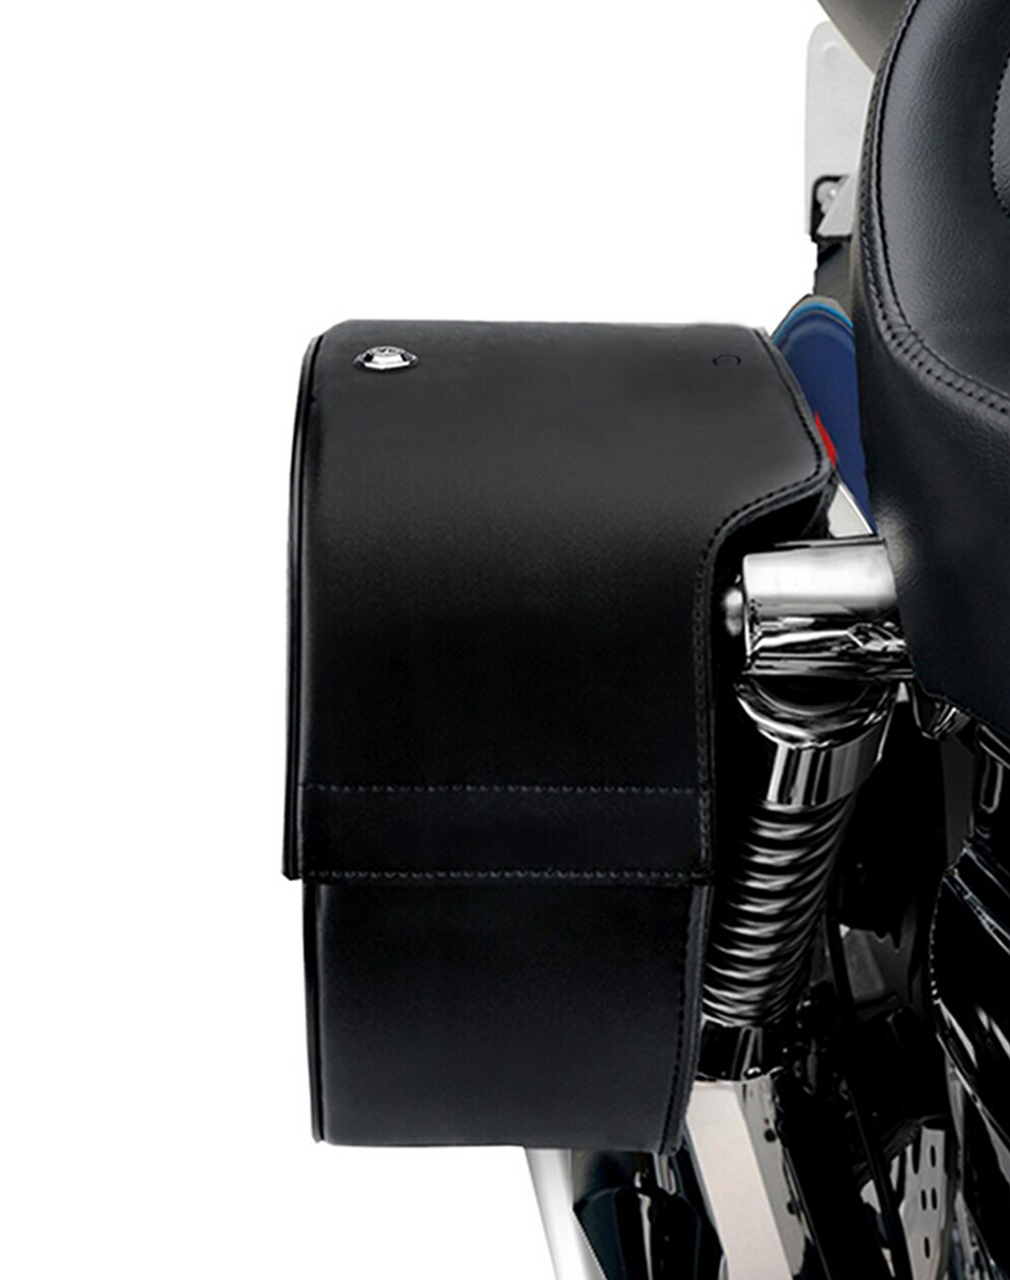 Kawasaki 1600 Mean Streak Shock Cutout Slanted Large Motorcycle Saddlebags Shock Cutout View